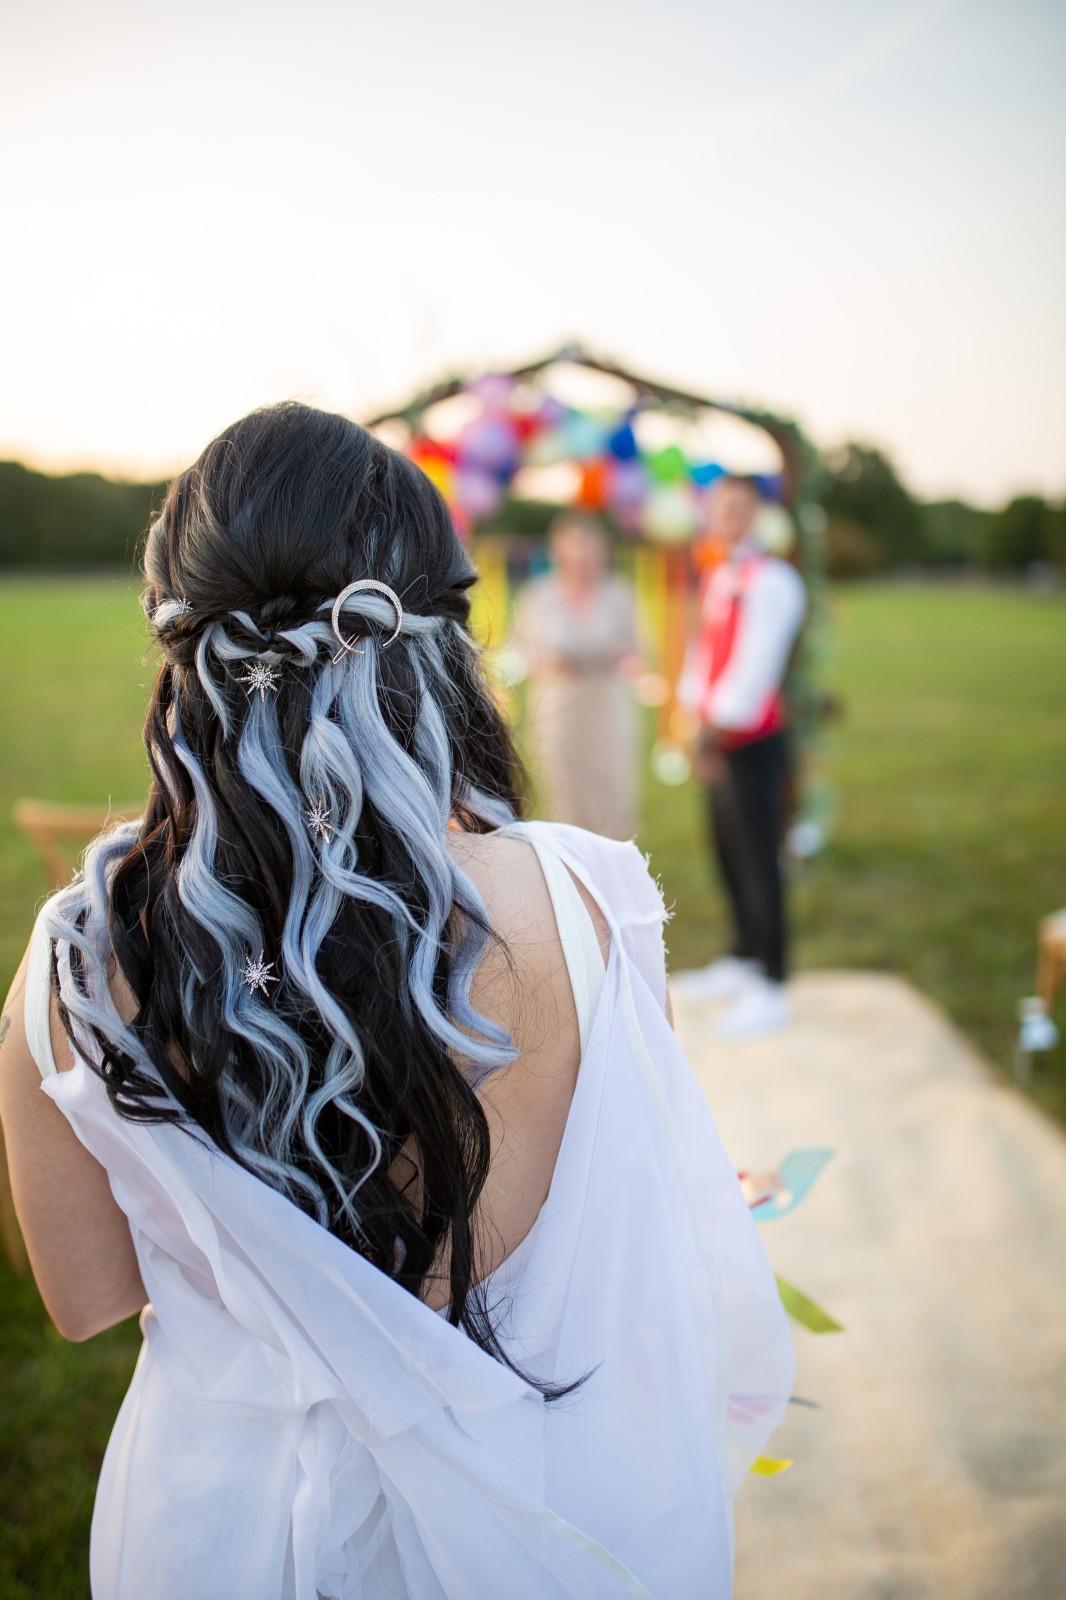 alternative wedding hair - celestial bridal hair - brown hair with blue streaks - bridal hair accessories